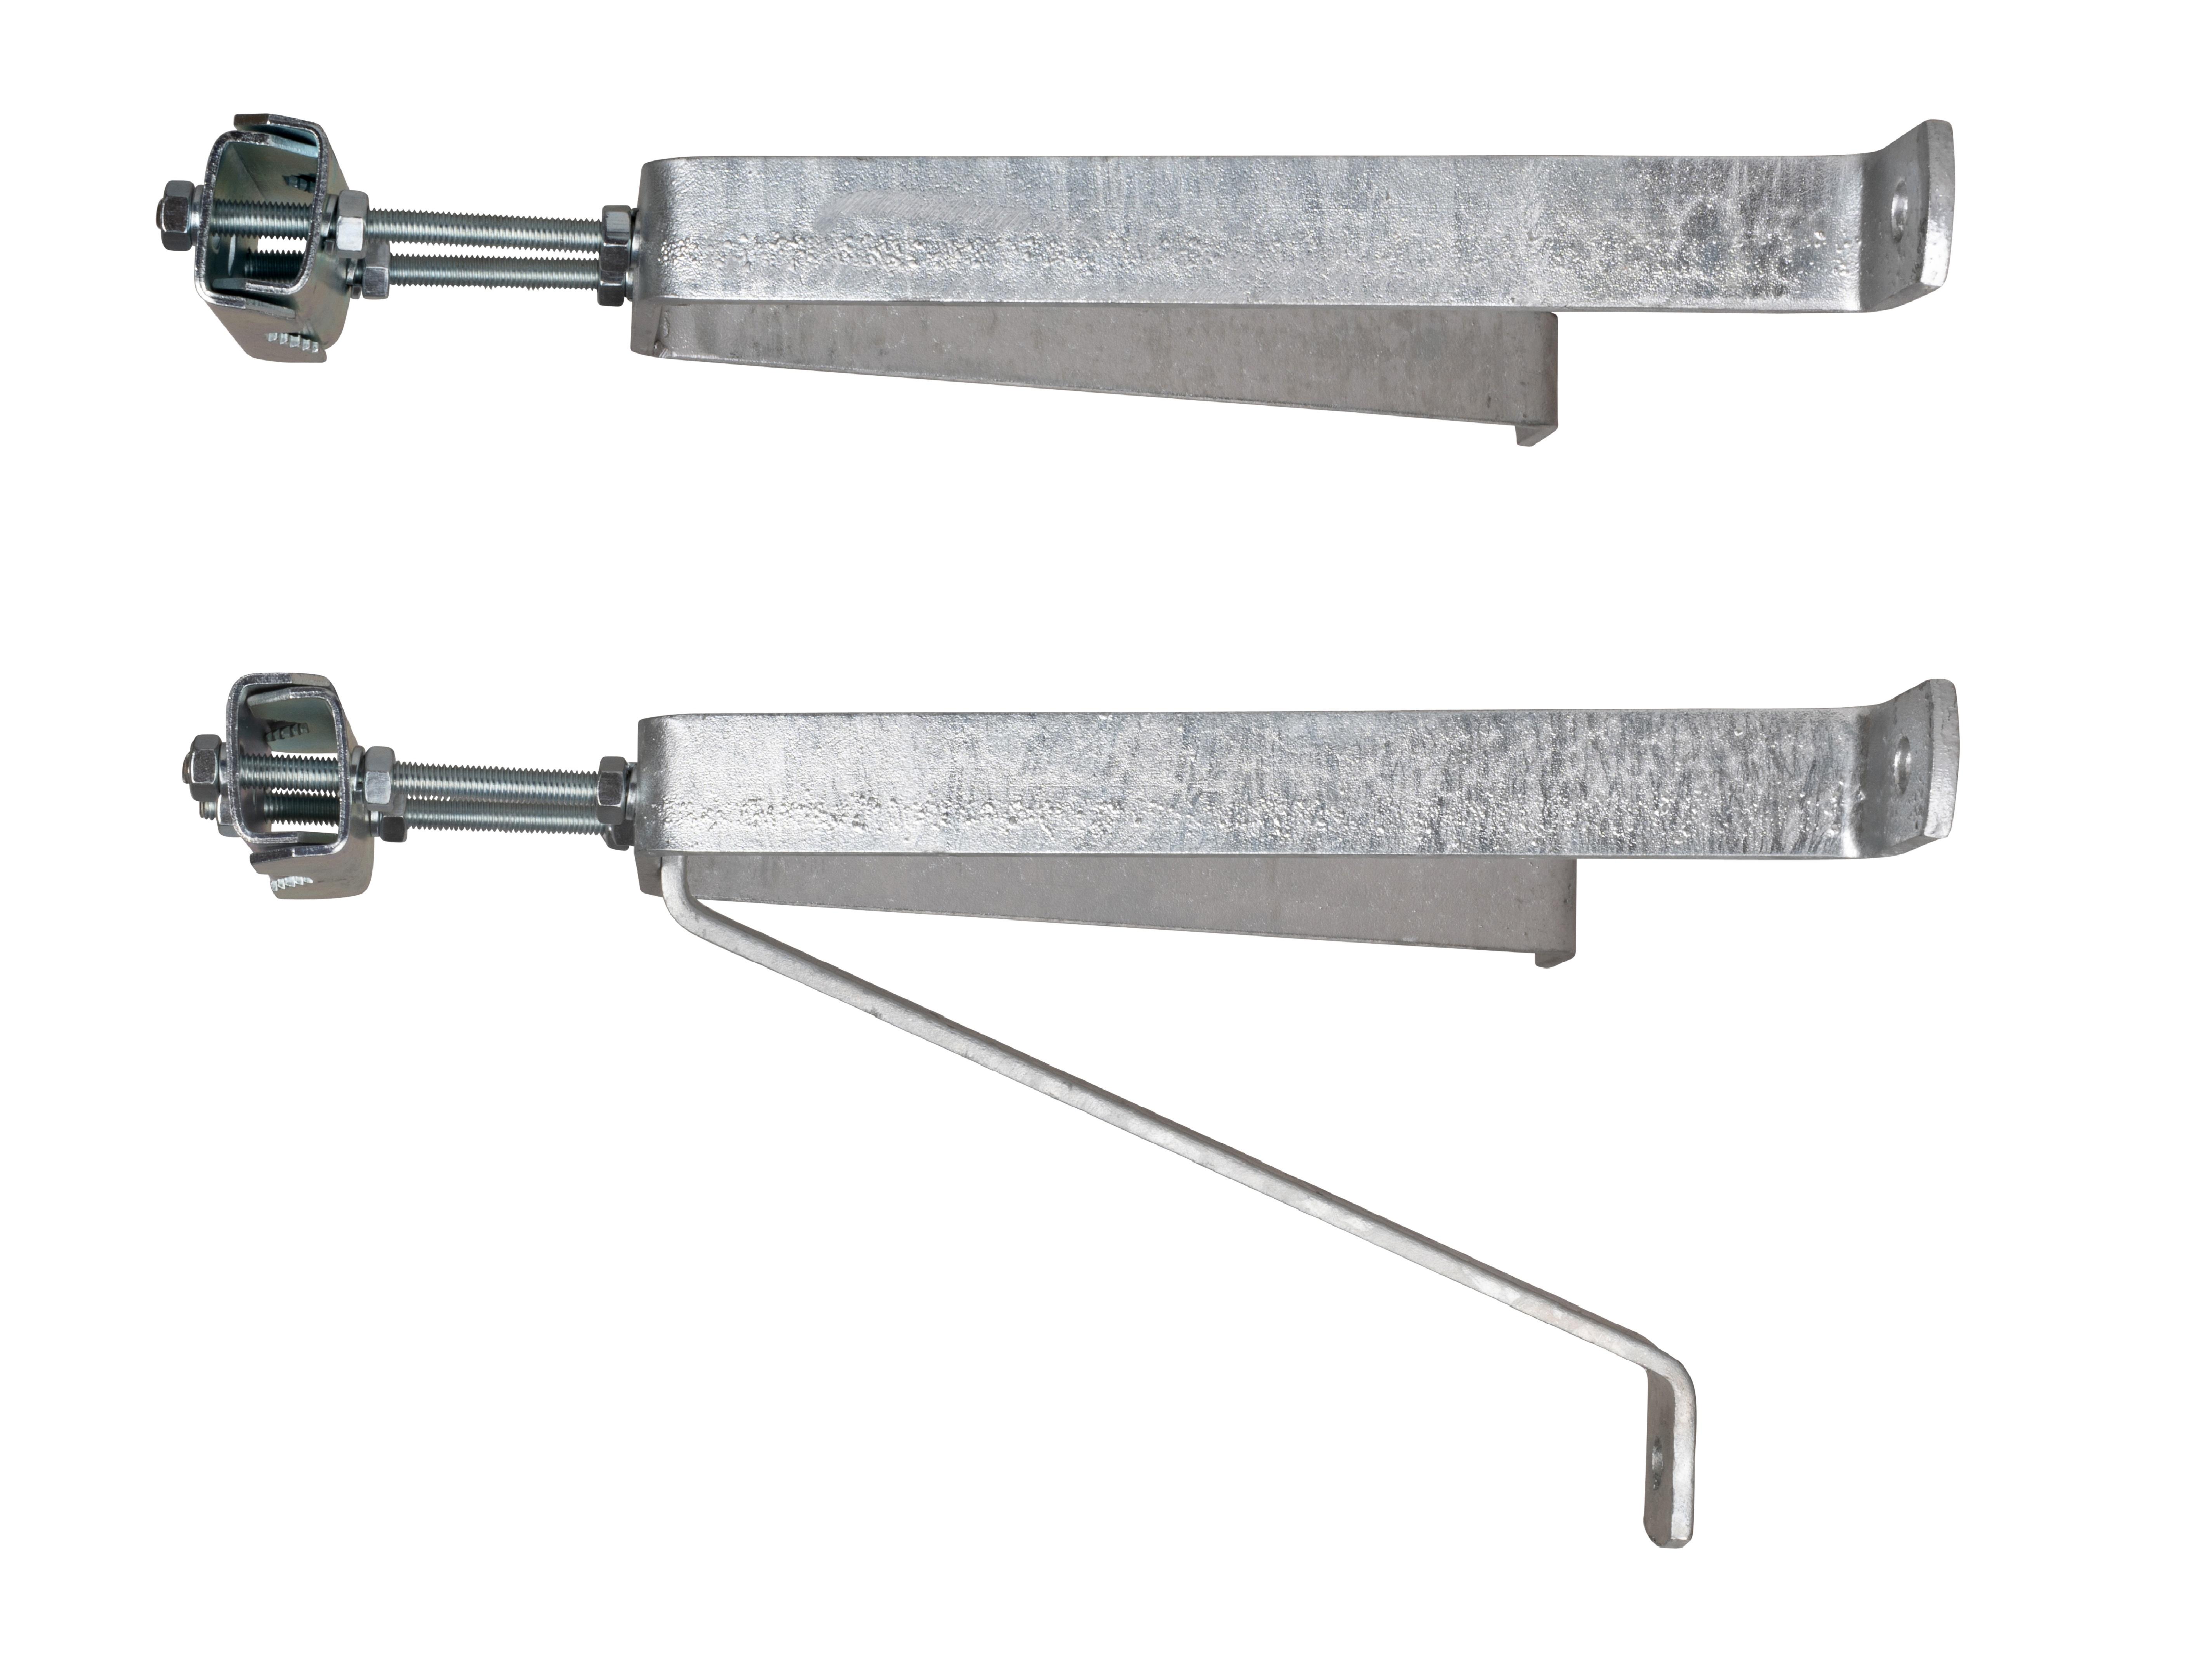 1 Stk SAT Mastbügel Garnitur 30cm, Mastrohre D=38mm-60mm, Stahl HSATWT30S-